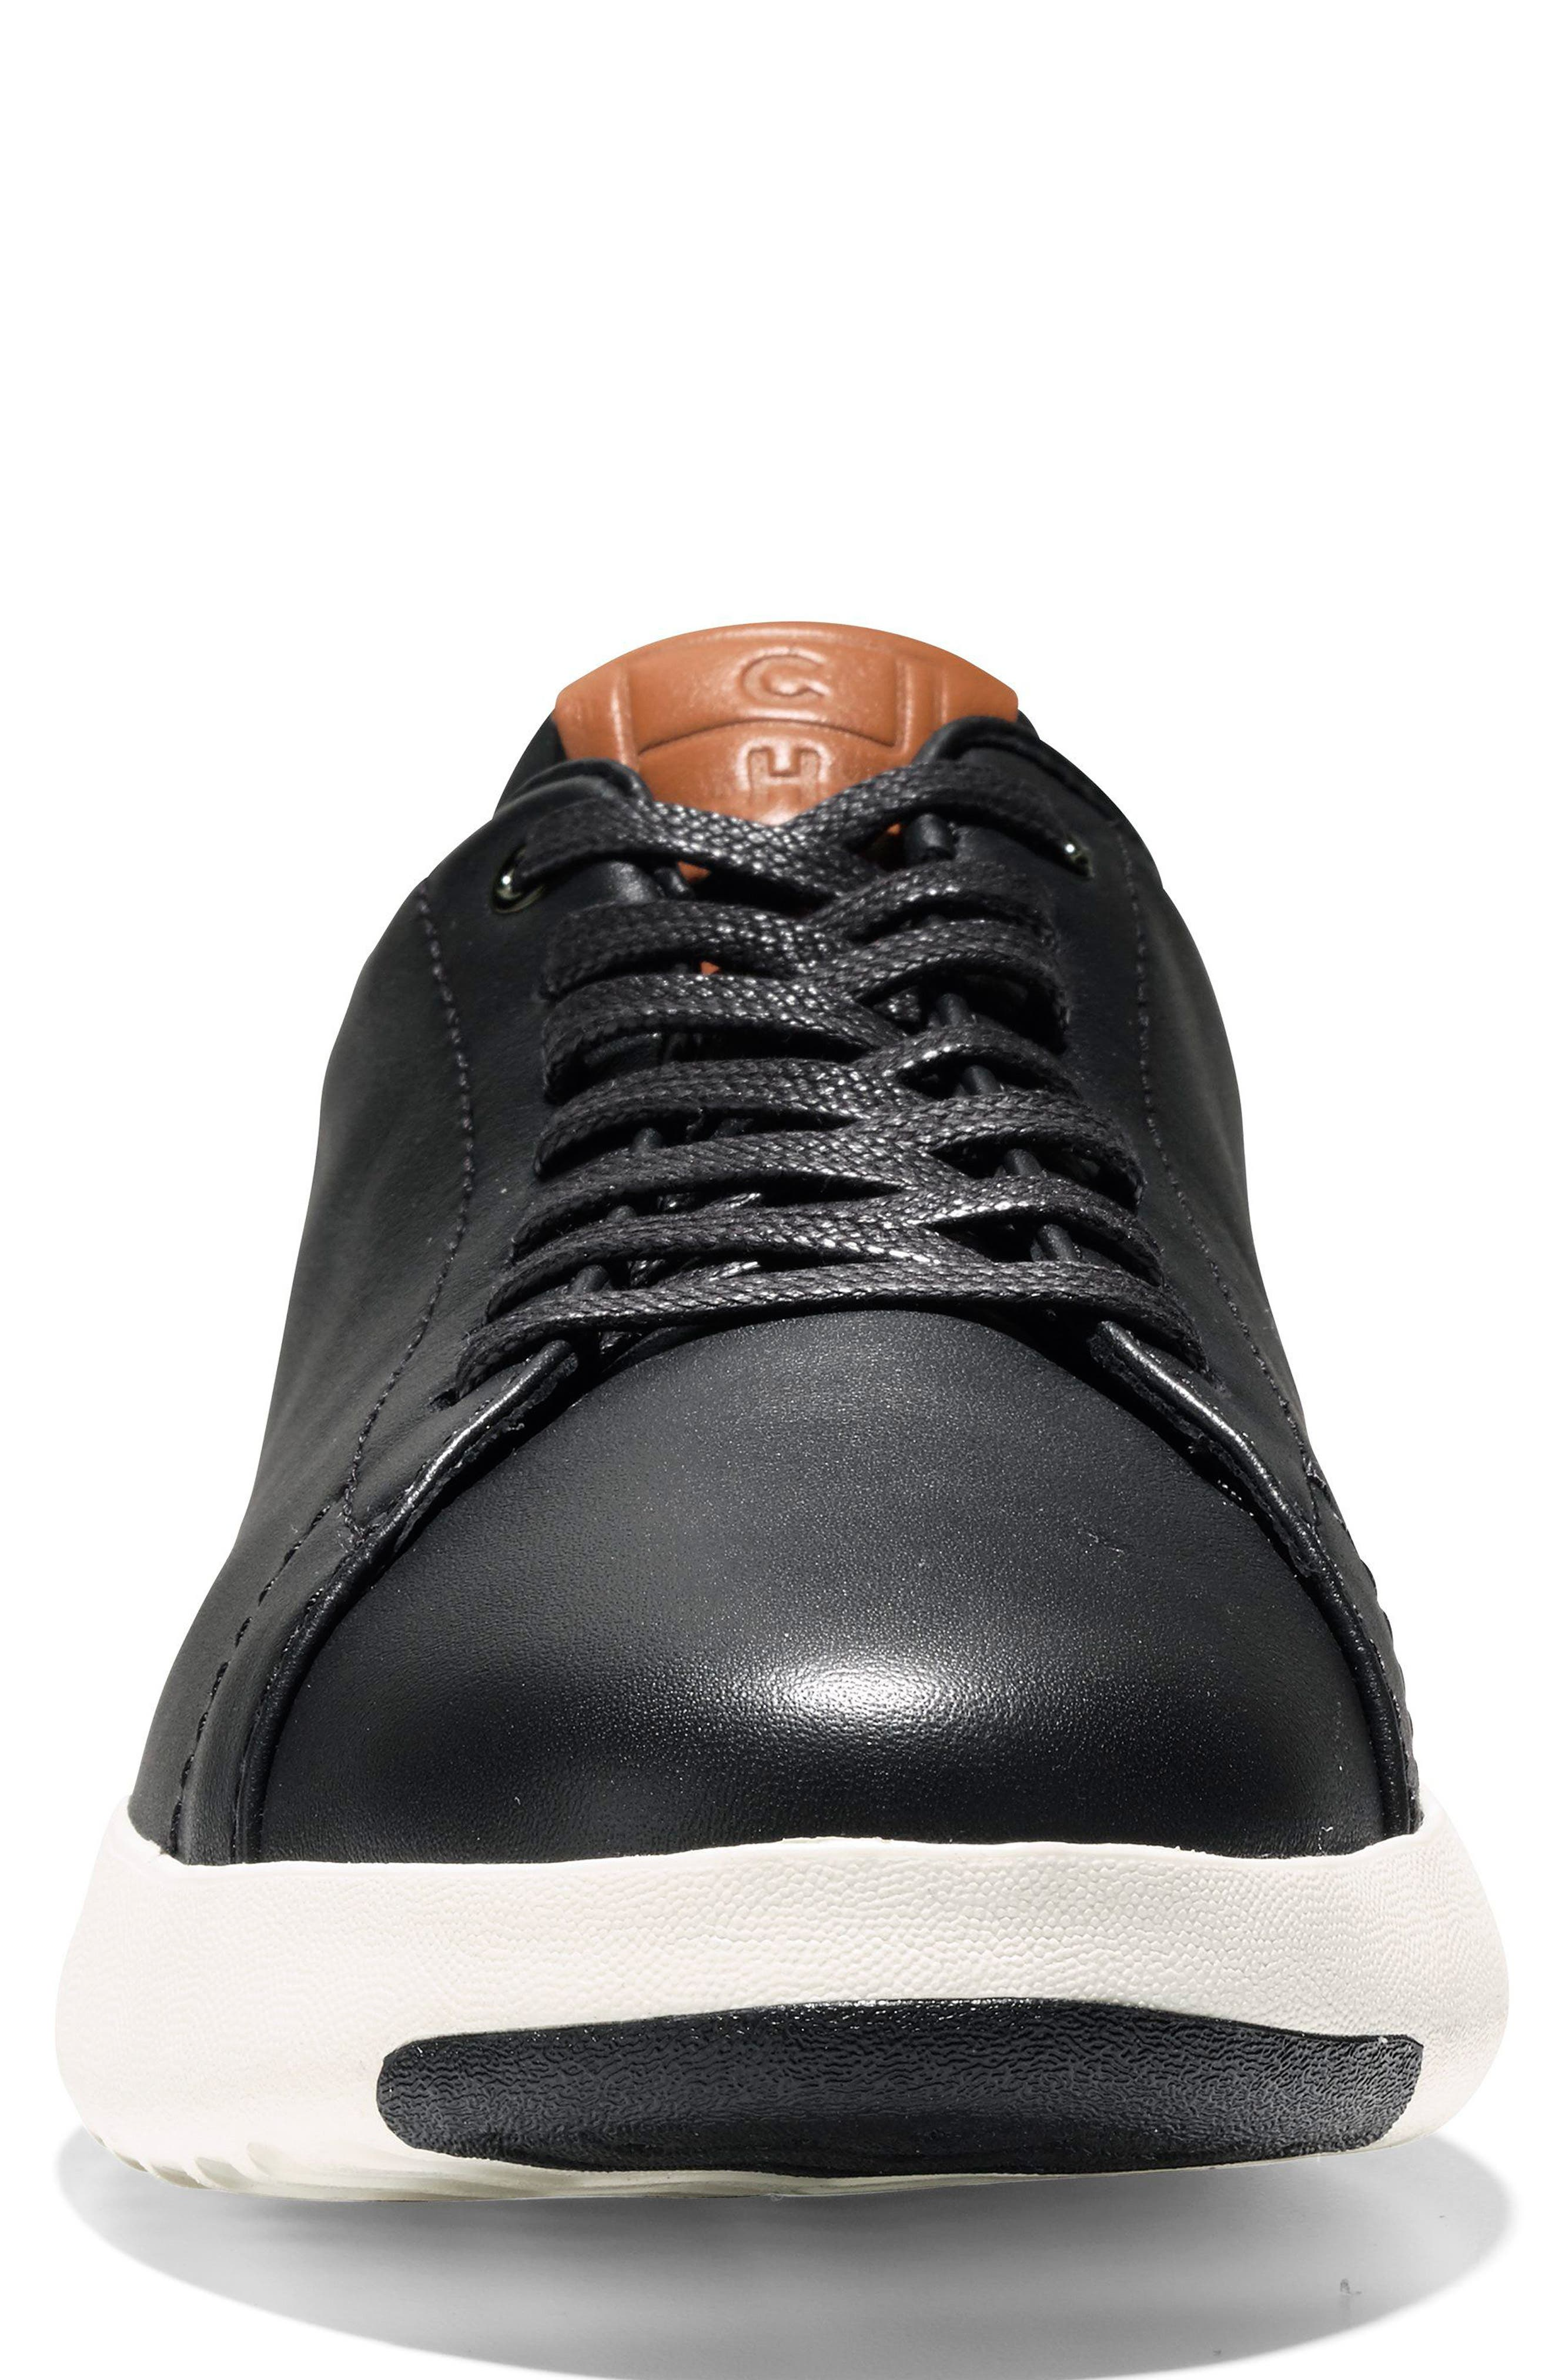 COLE HAAN, GrandPro Tennis Sneaker, Alternate thumbnail 4, color, BLACK/ BRITISH TAN